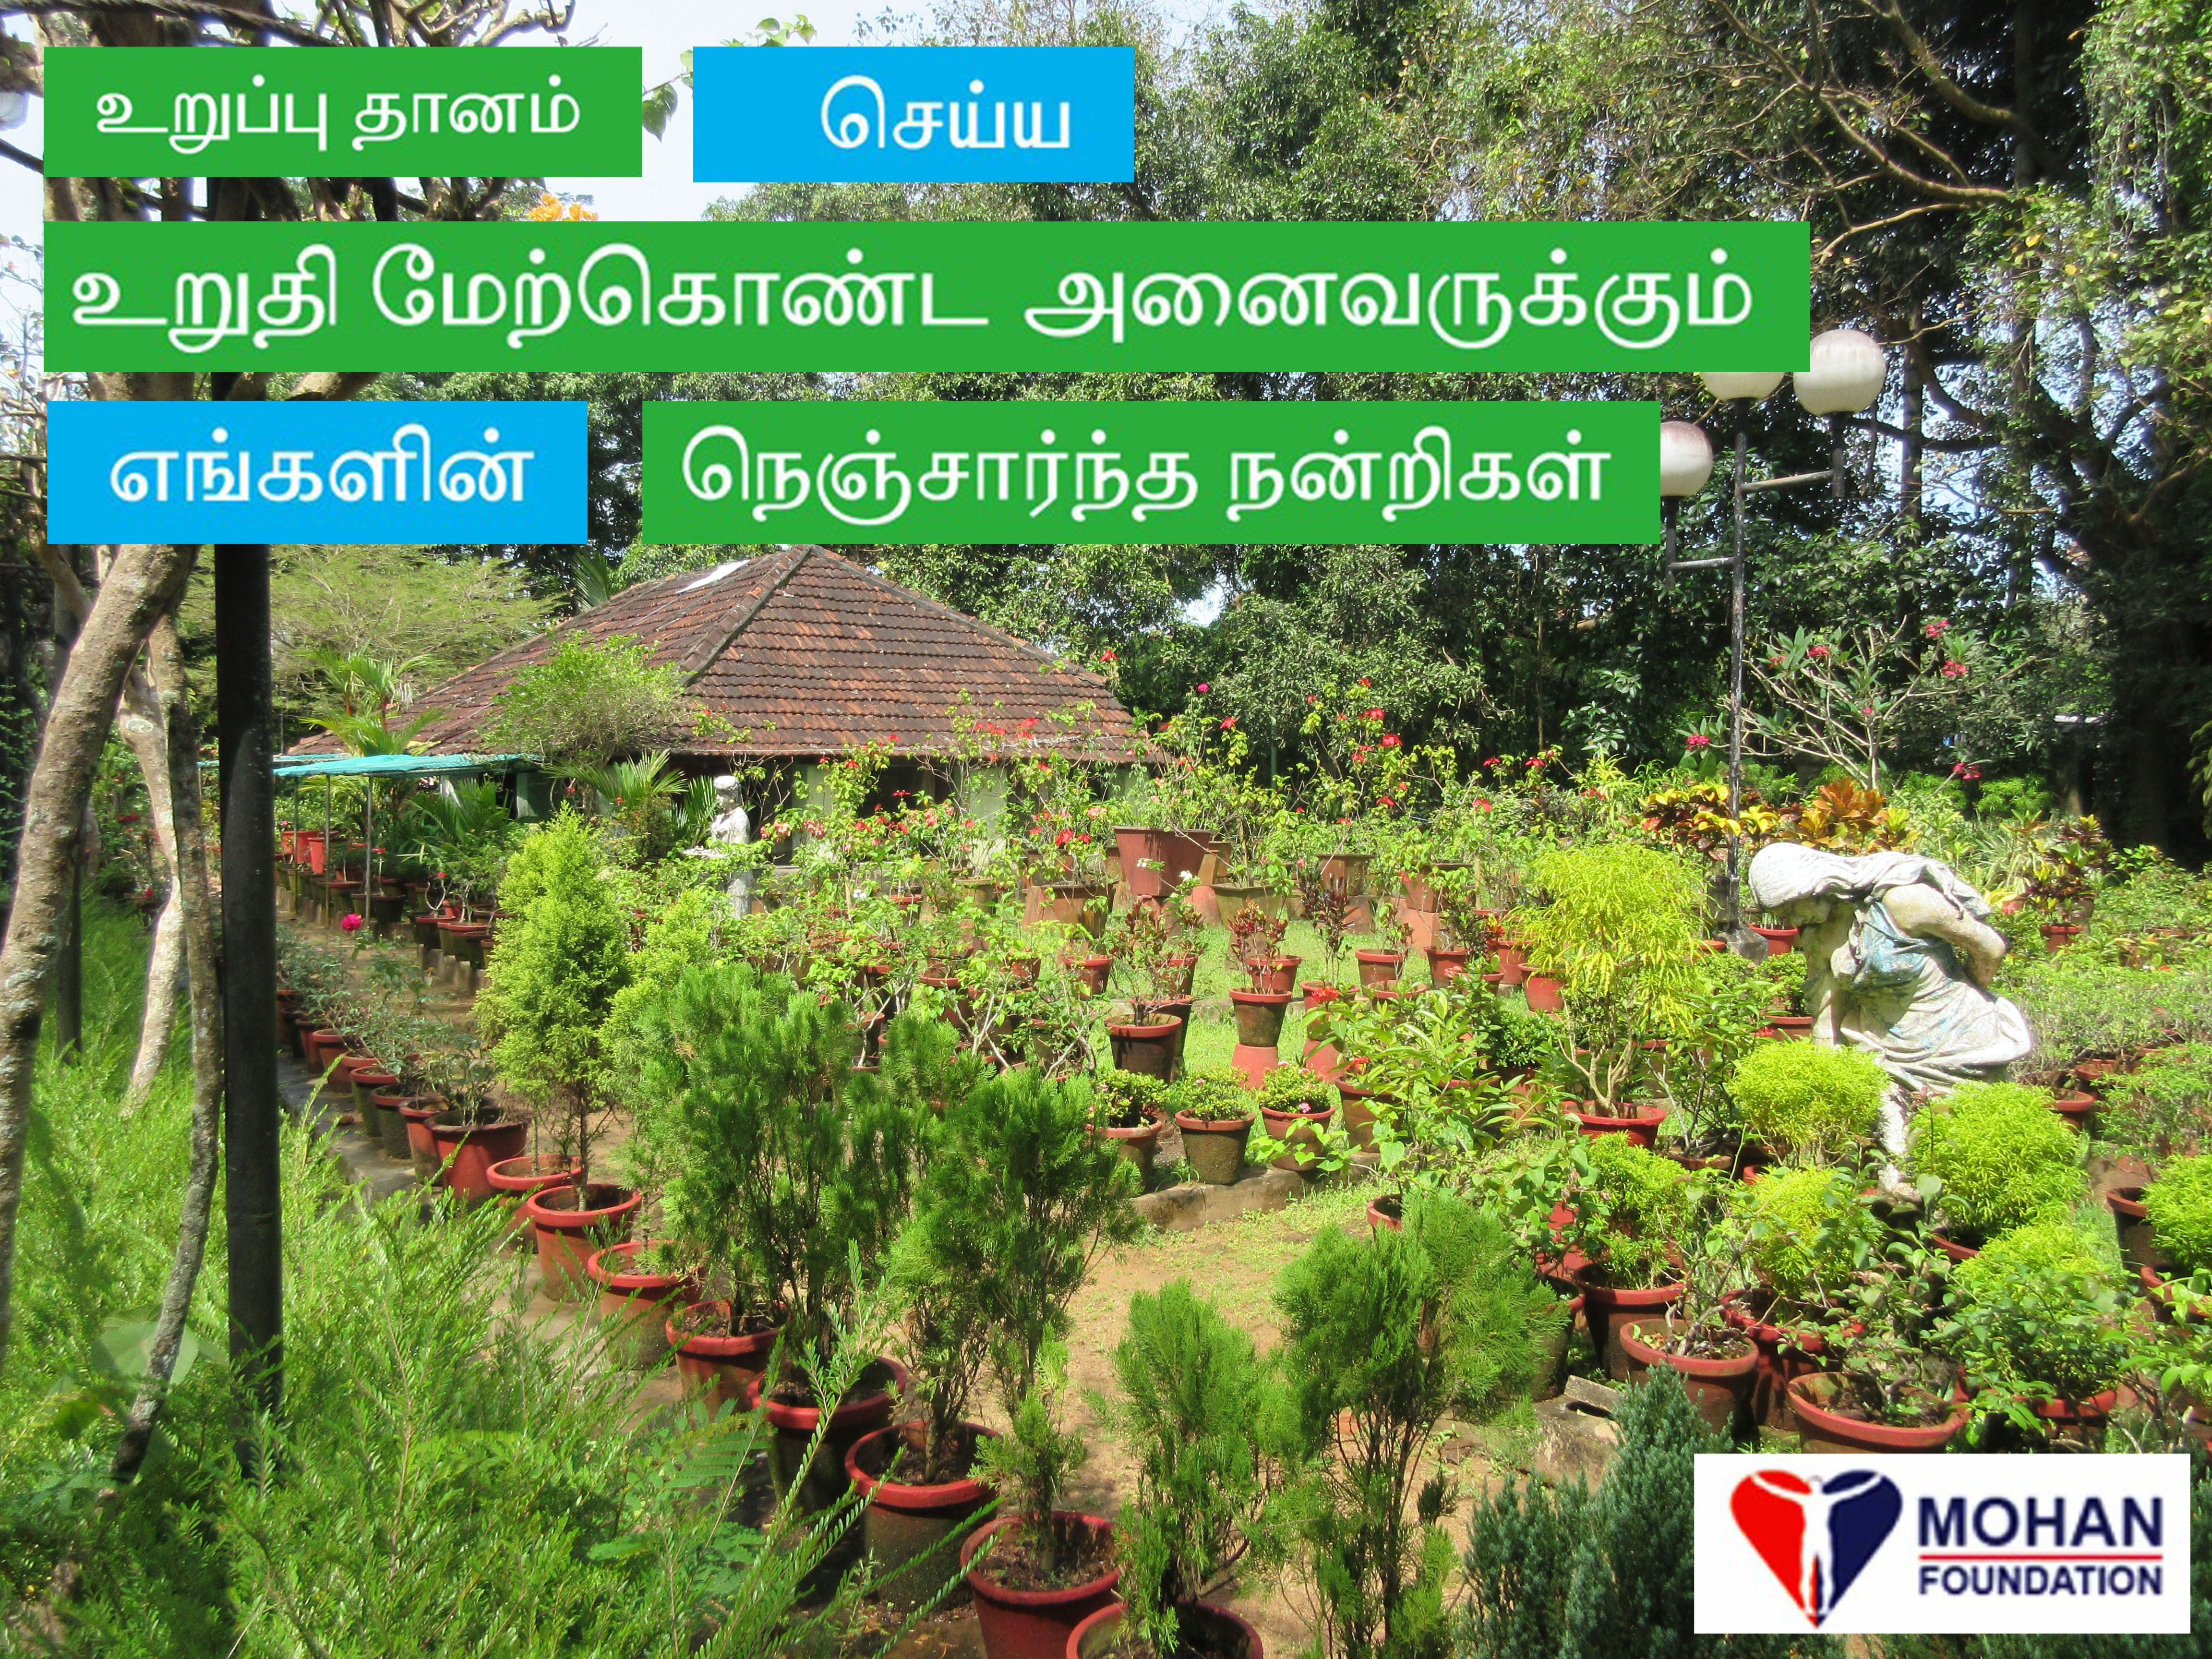 Kochi, Kerala gardens #drbarryindia @MOHANFoundation